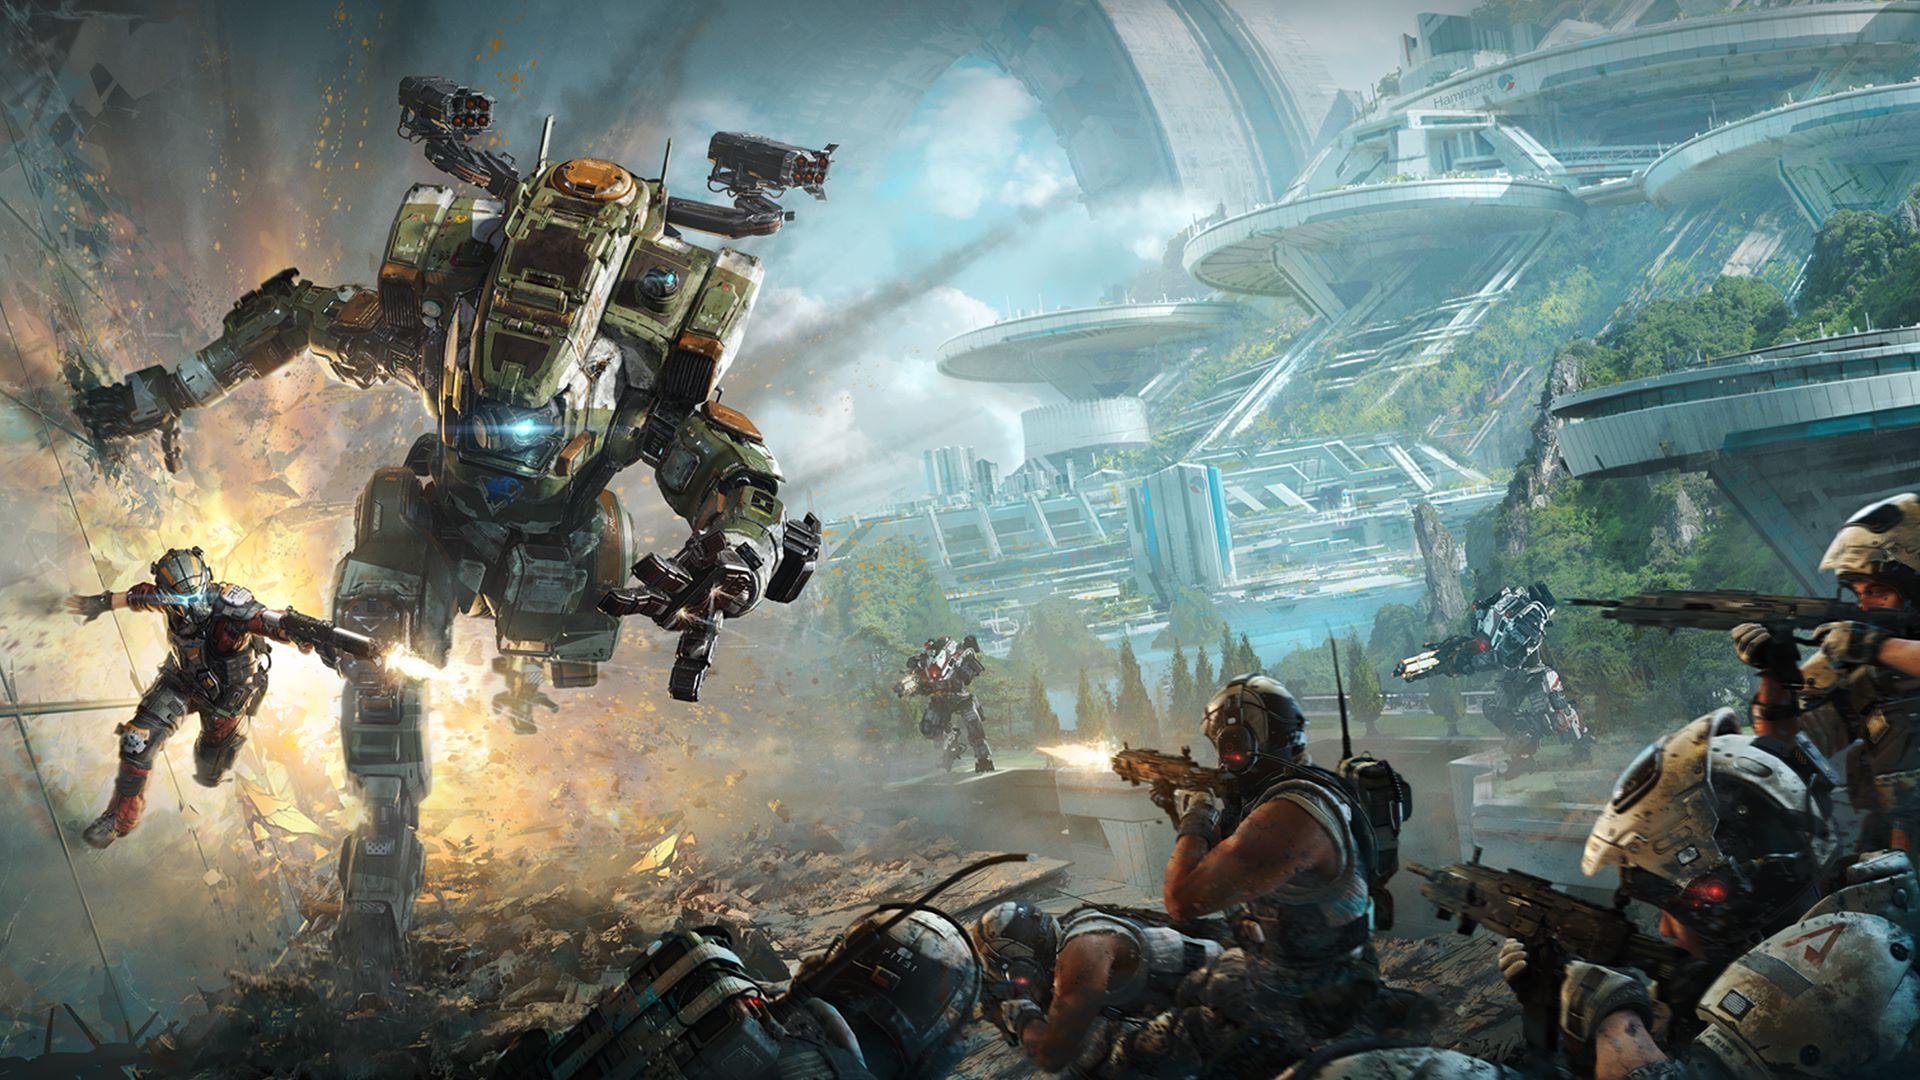 Prueba abierta de multijugador de Titanfall™ 2